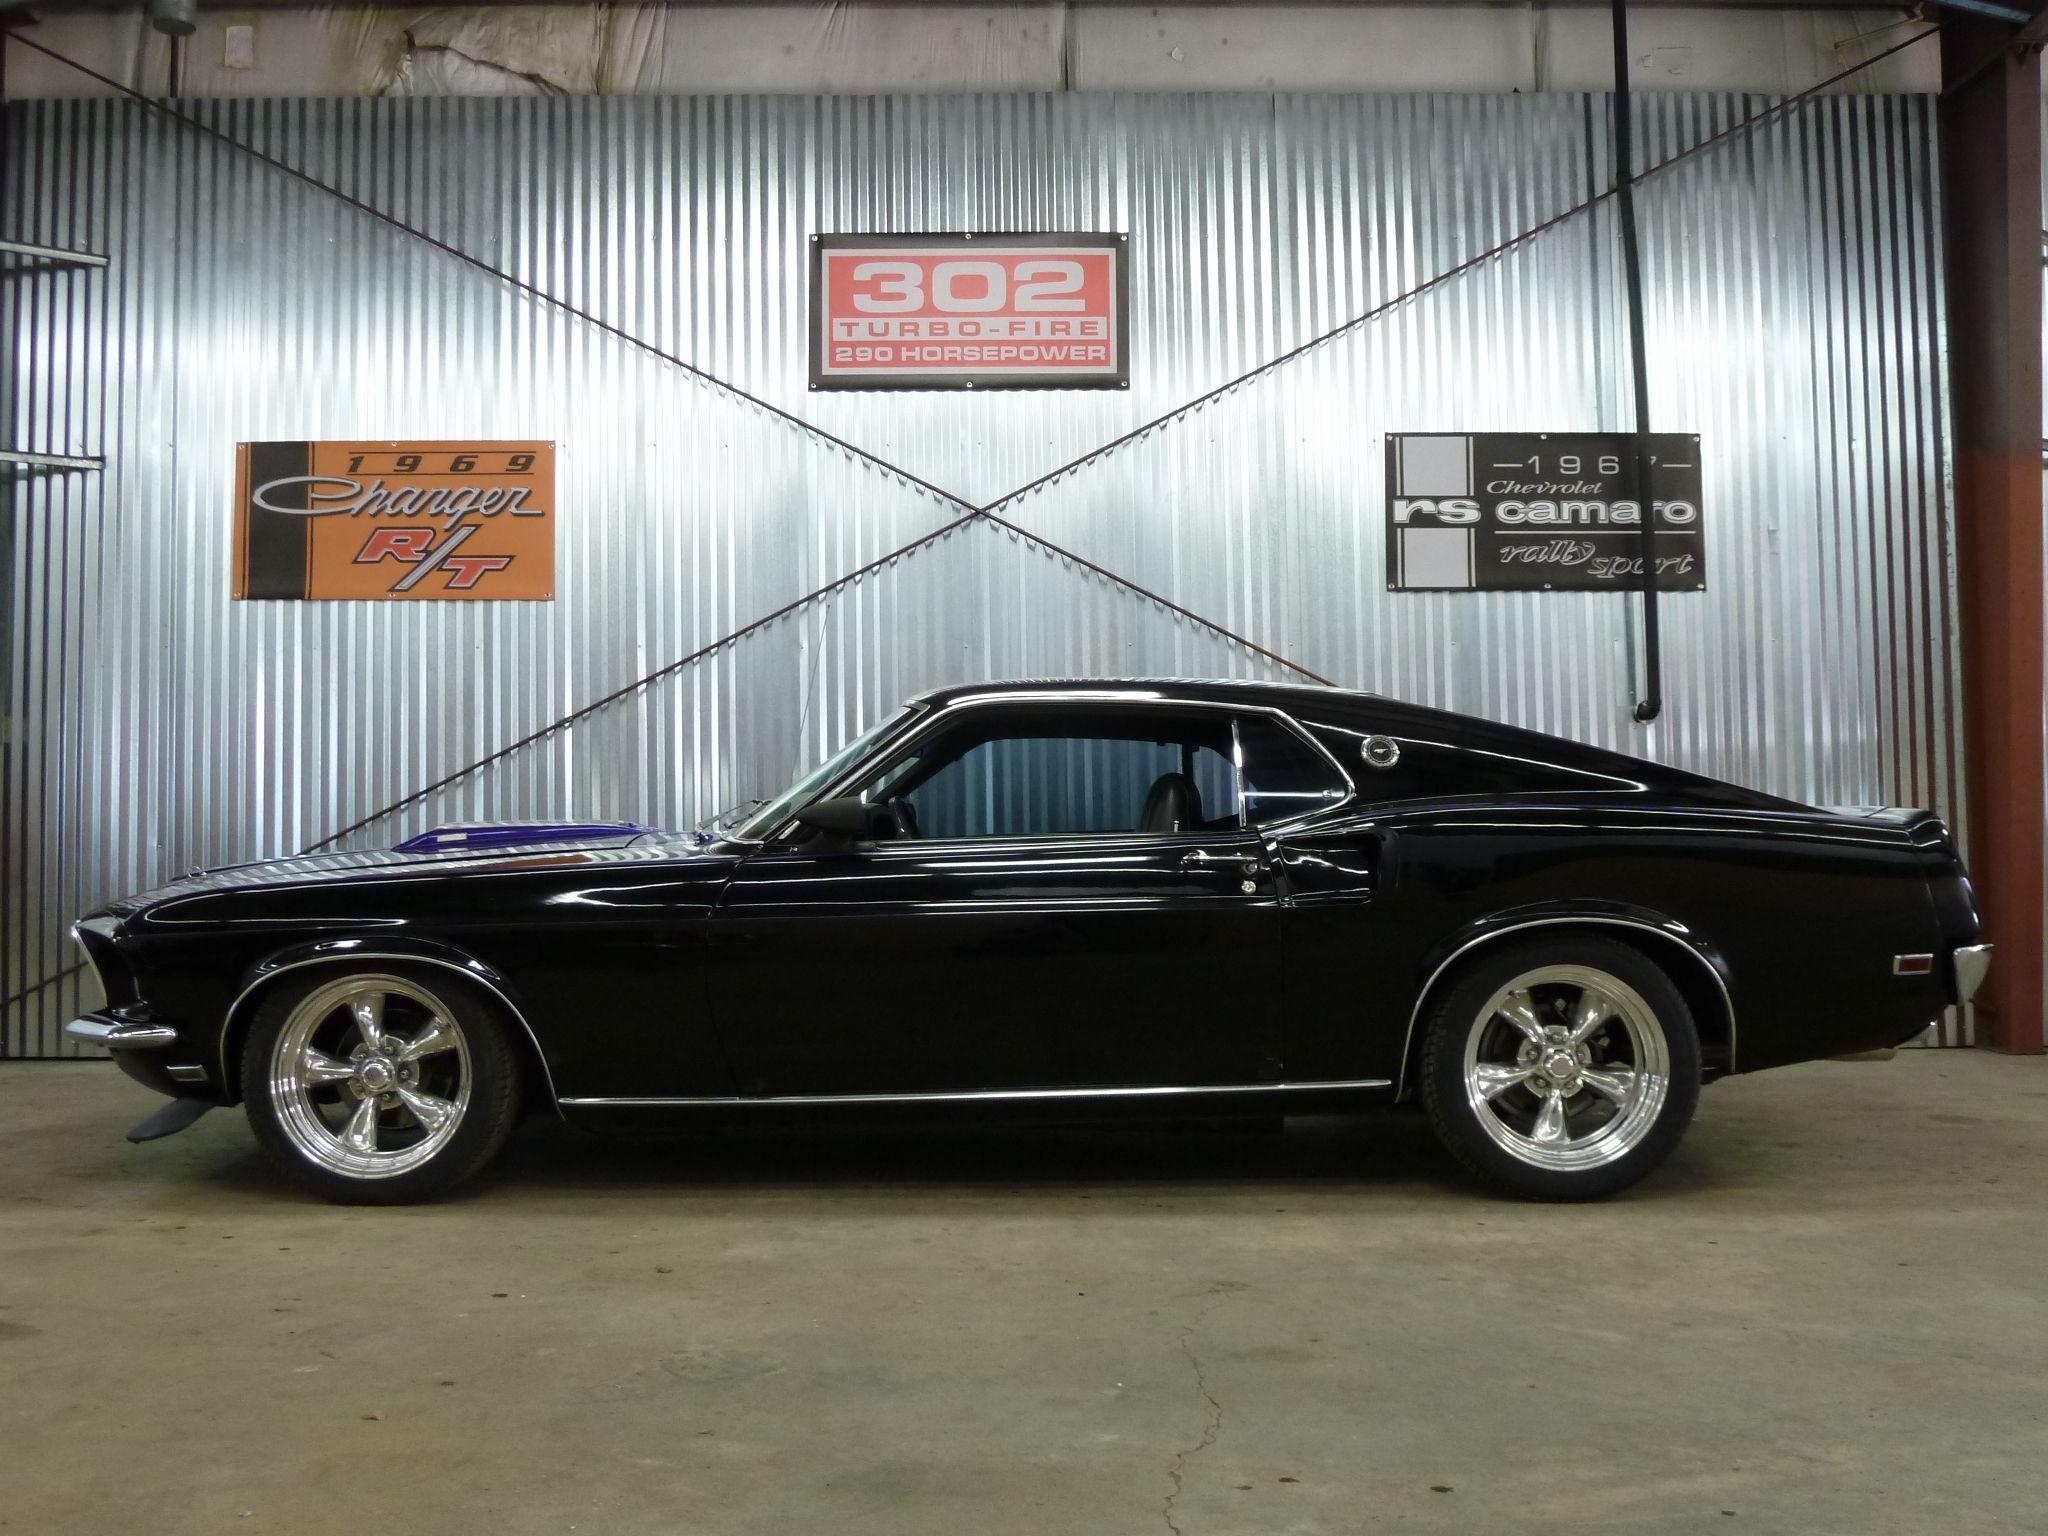 Image Detail For 1969 Mustang Fastback 428cj 4 Speed 4 Wheel